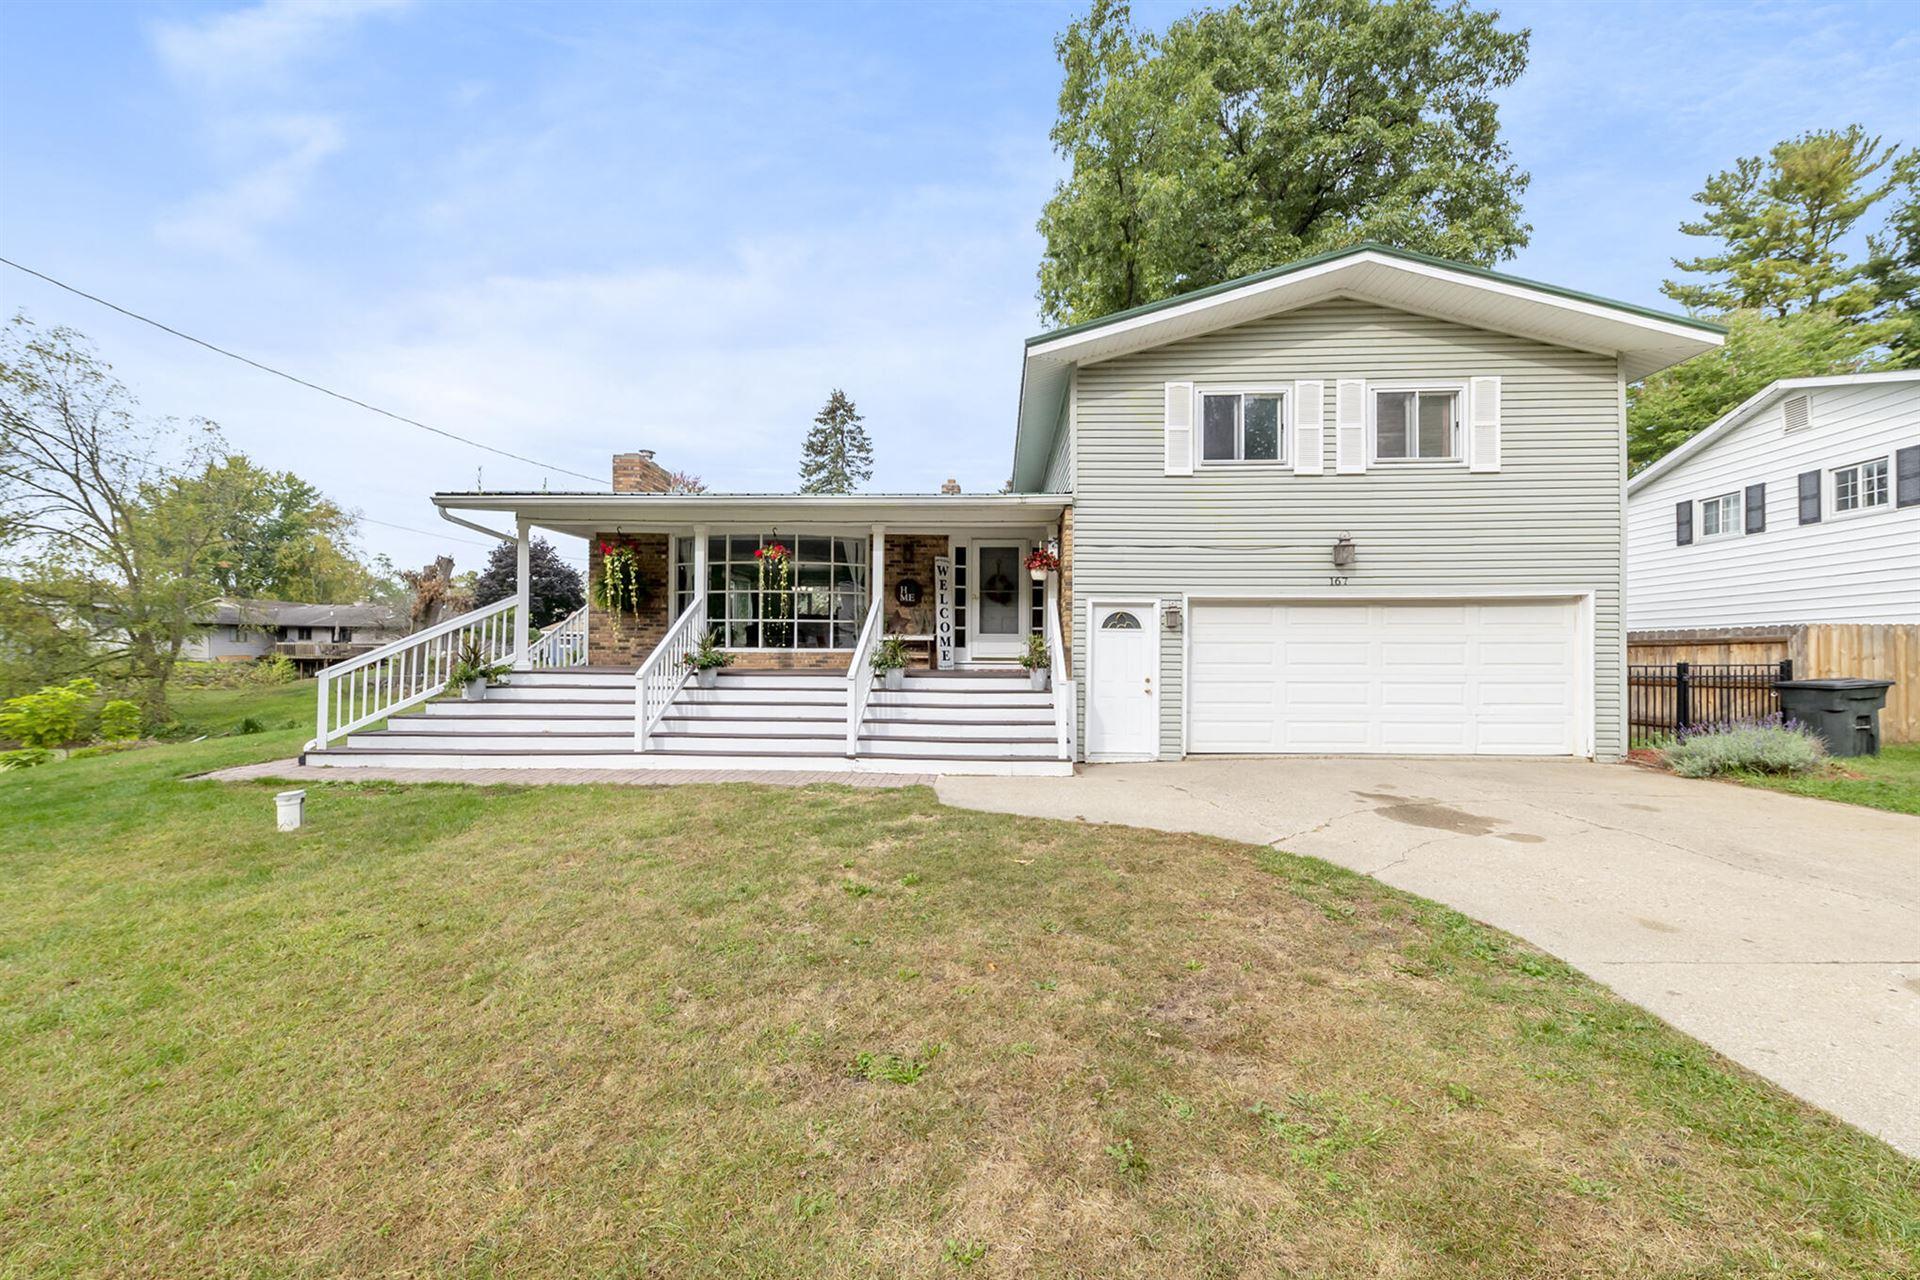 167 Woodridge Drive, Battle Creek, MI 49017 - MLS#: 21109055